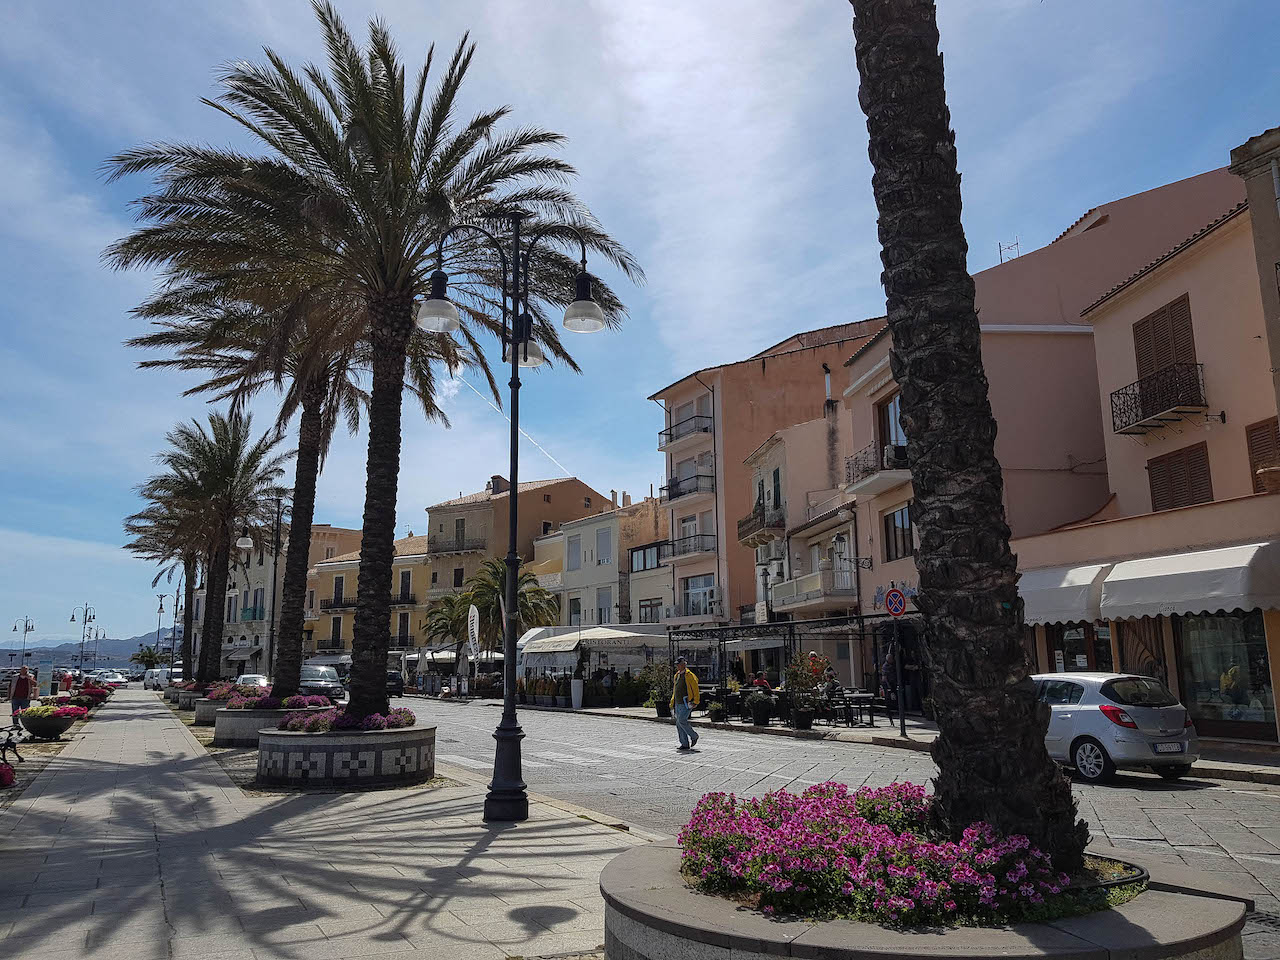 Auf der Insel La Maddalena.